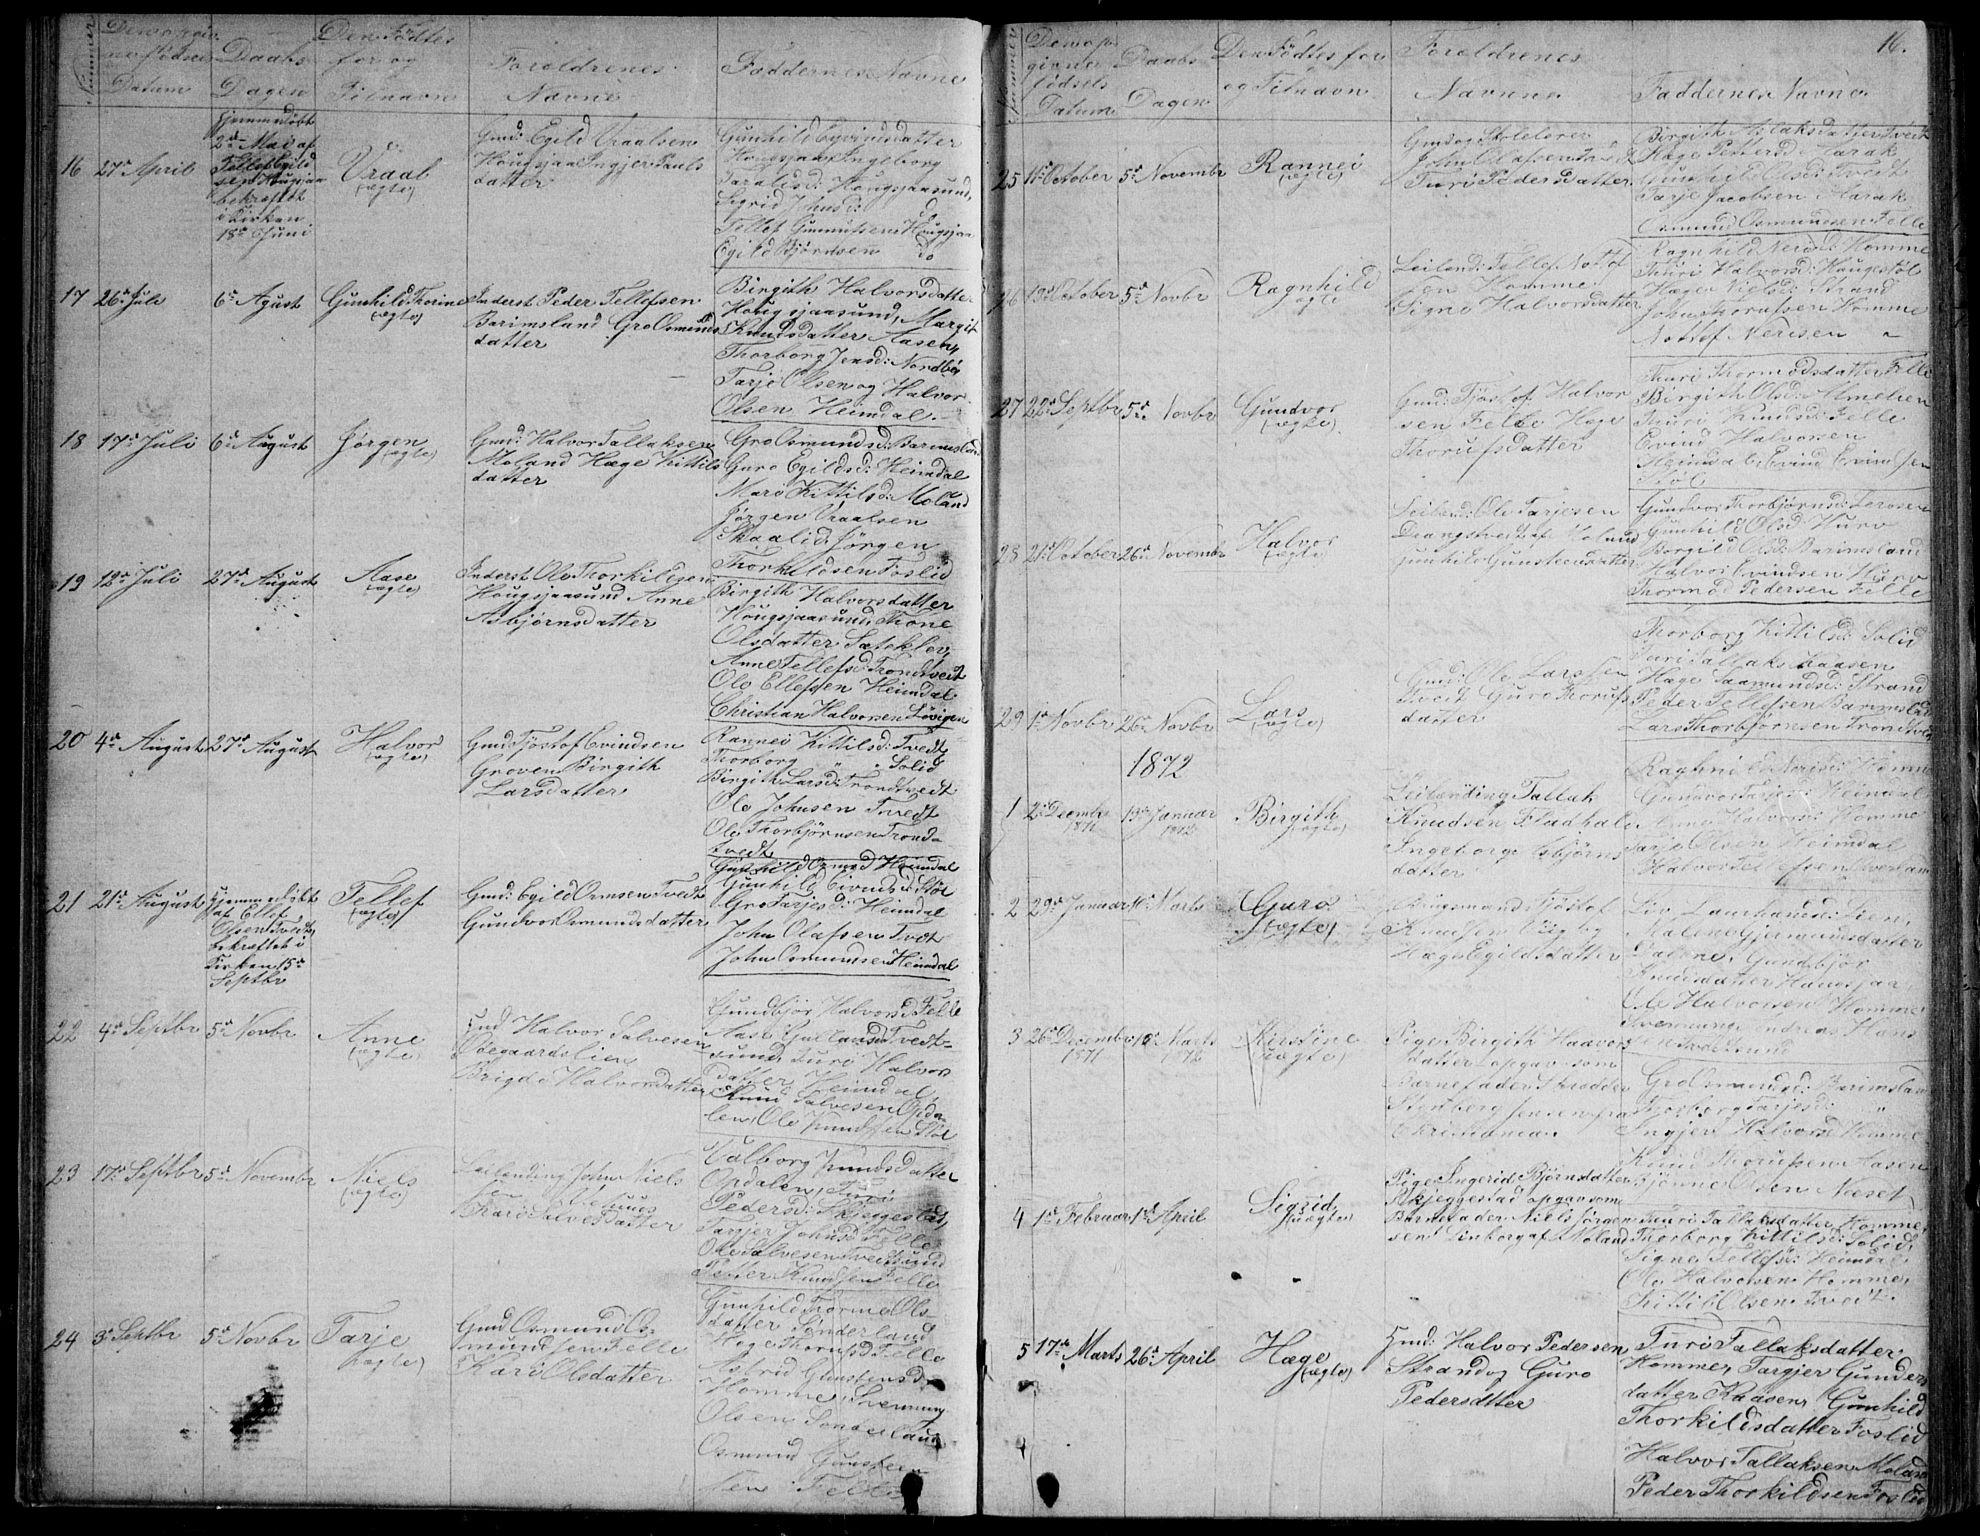 SAKO, Nissedal kirkebøker, G/Gb/L0002: Klokkerbok nr. II 2, 1863-1892, s. 16